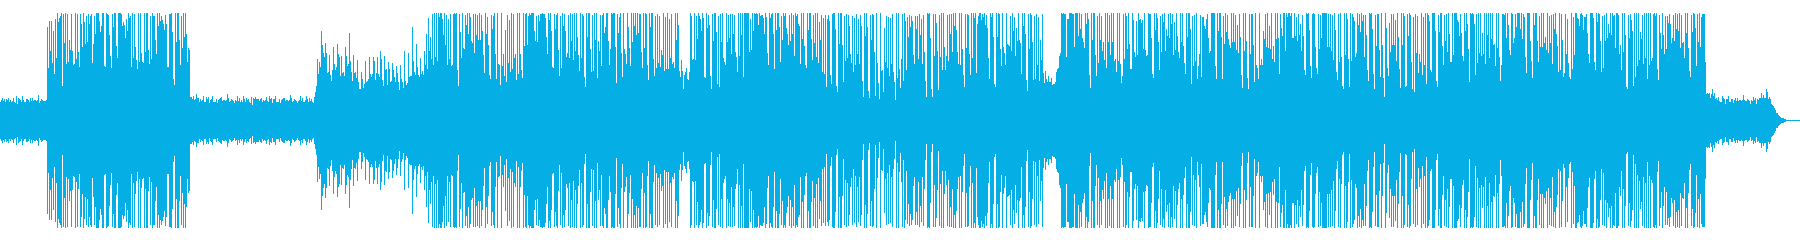 80s レトロ・シンセポップ、インストの再生済みの波形